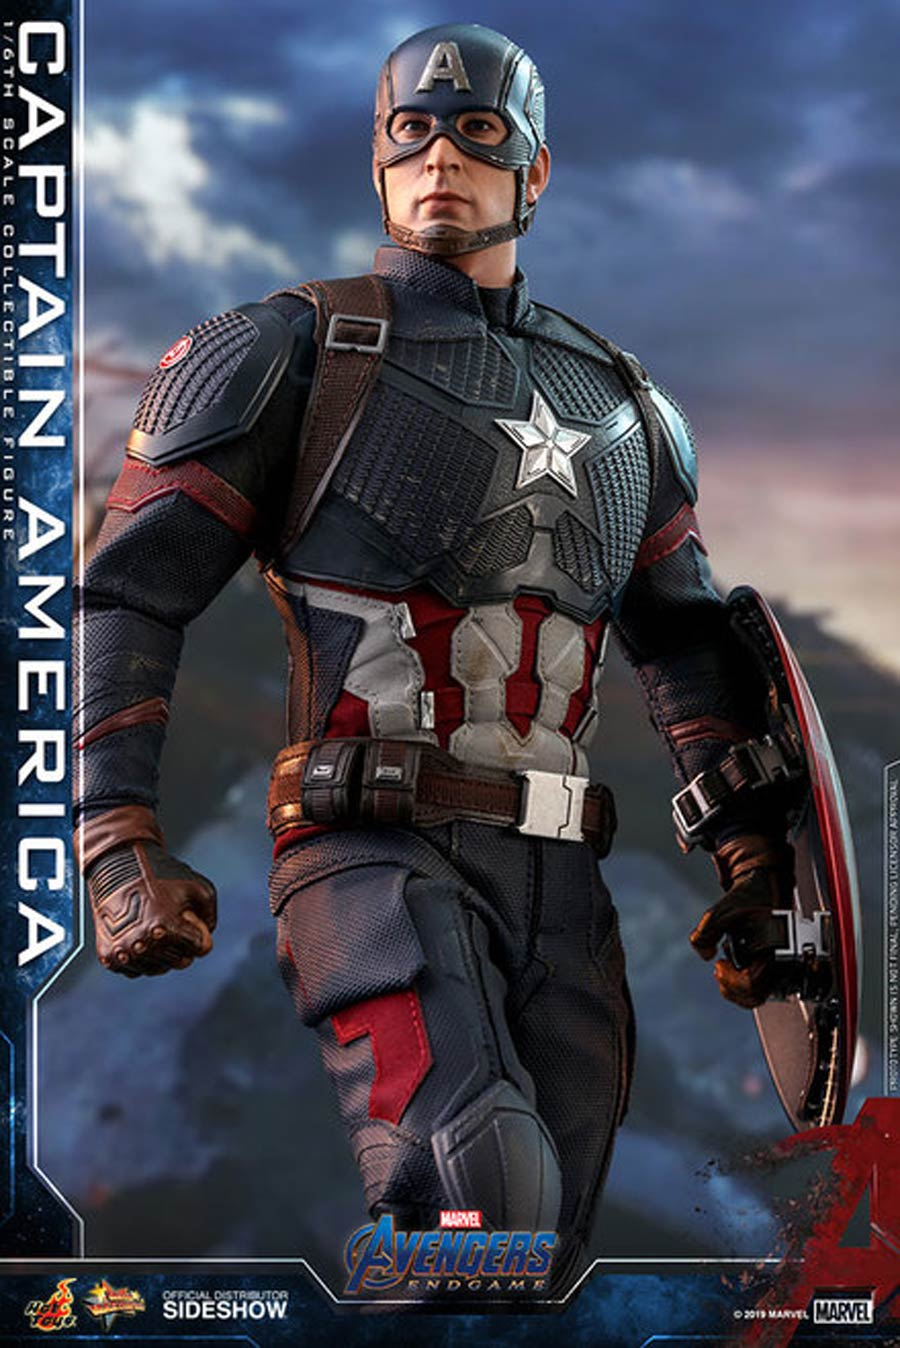 Avengers Endgame Captain America Sixth Scale Figure